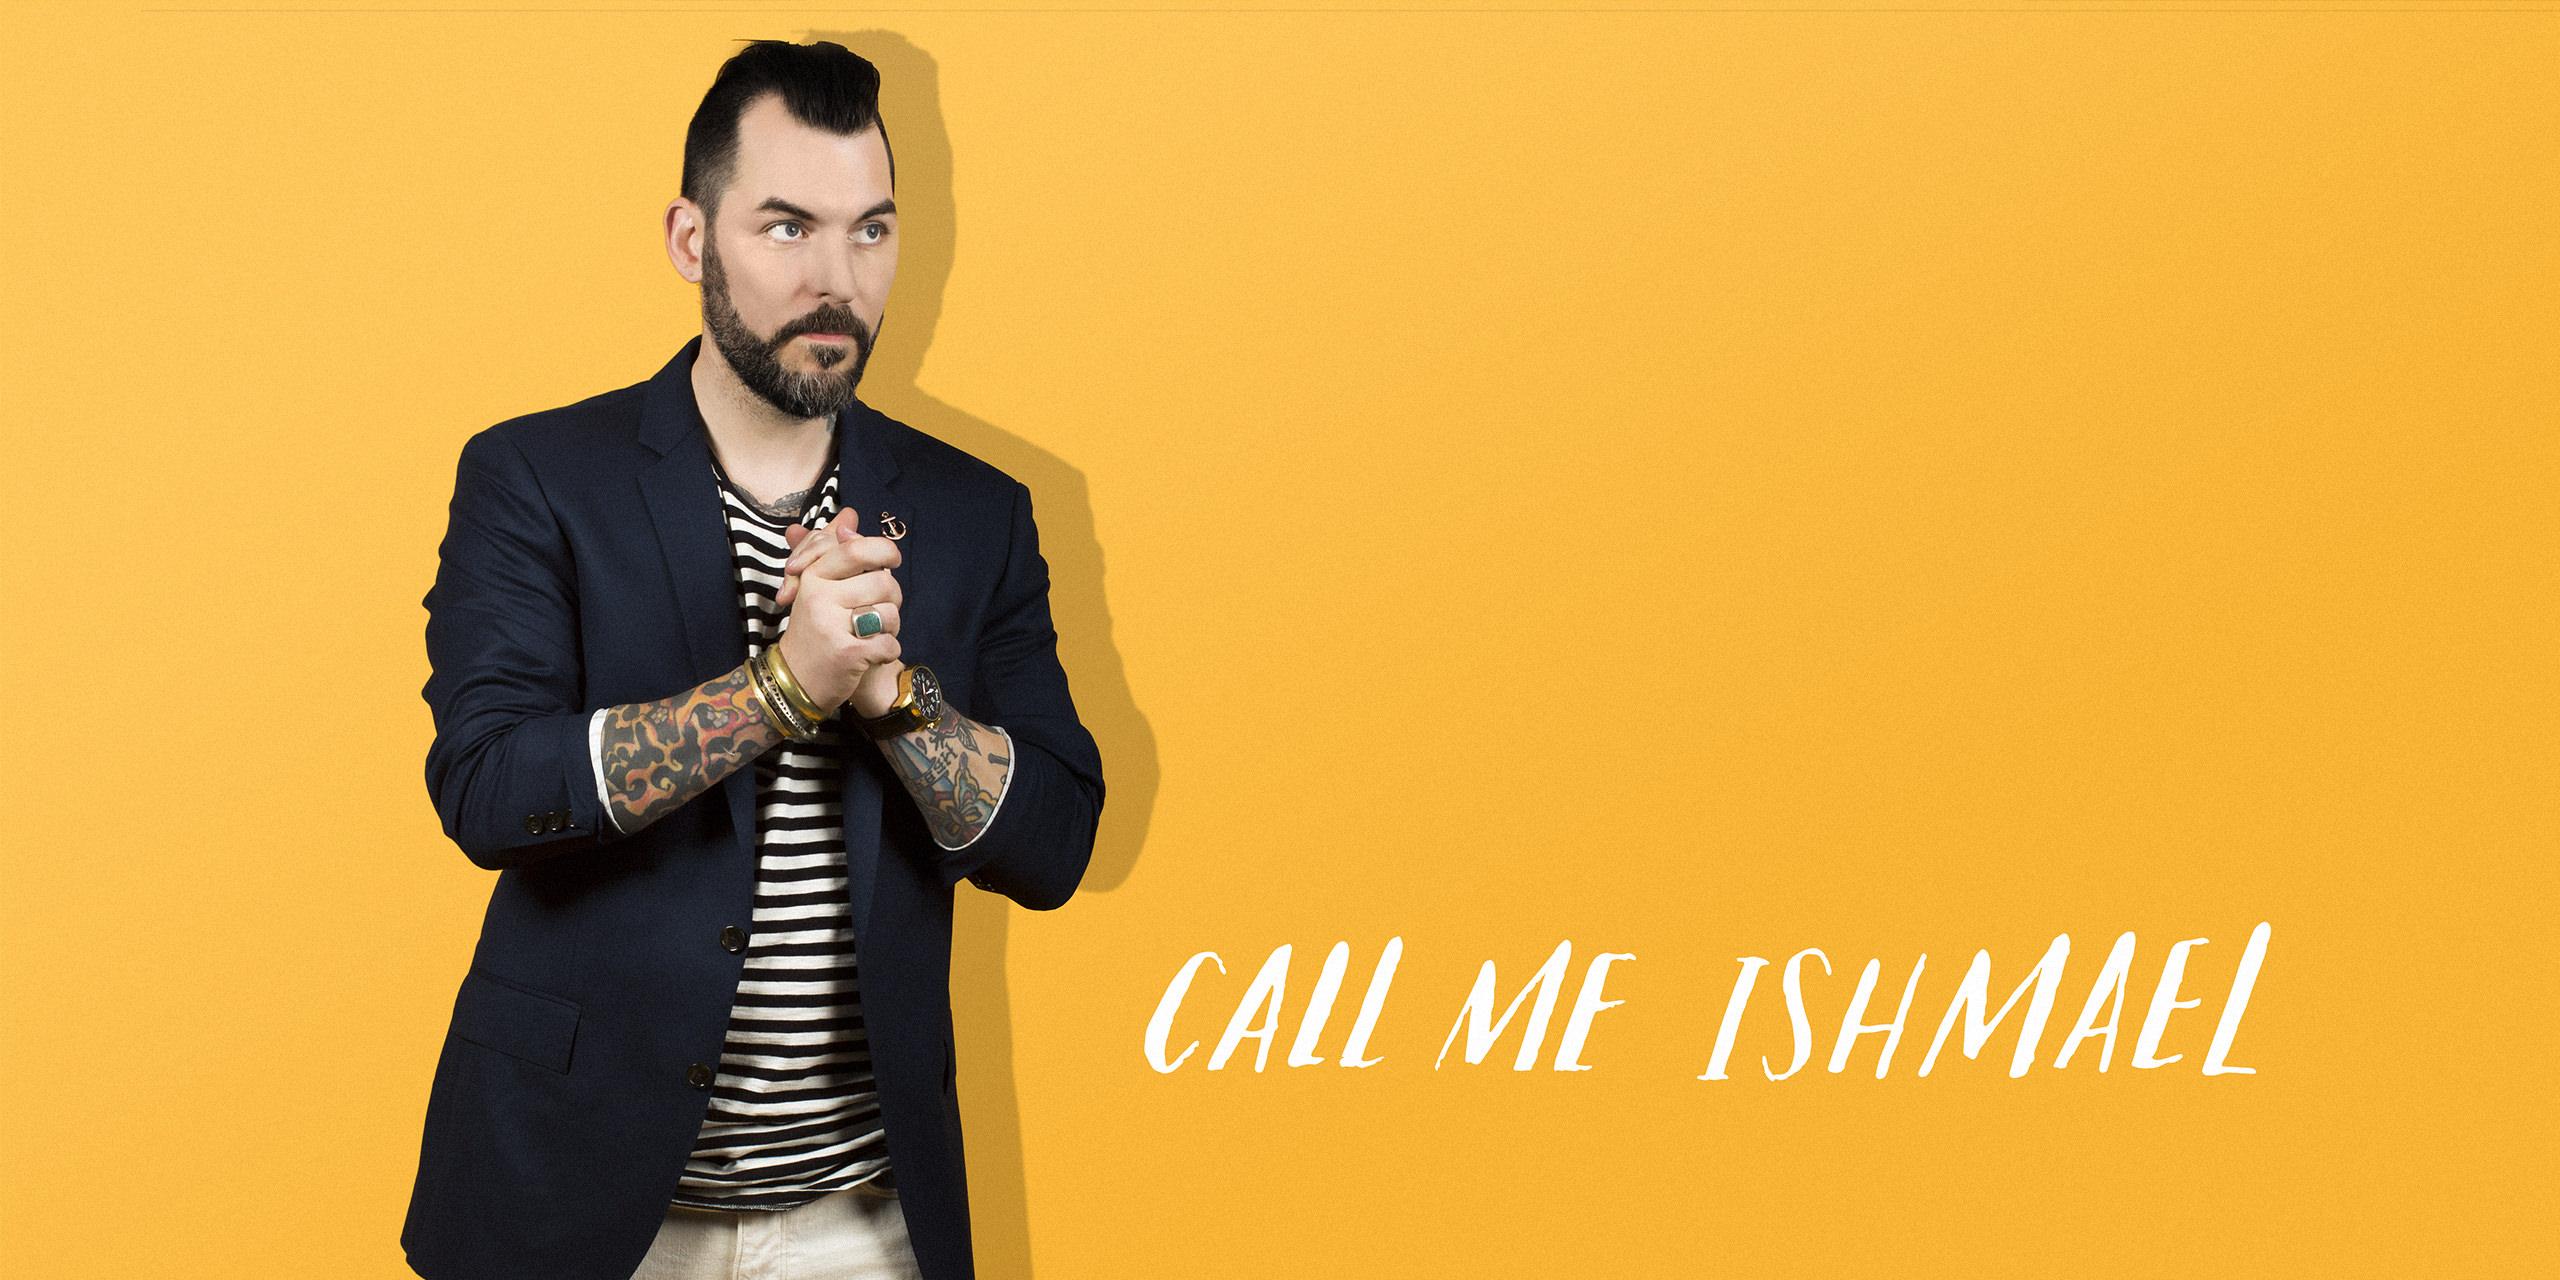 5-Ways-Call-Me-Ishmael